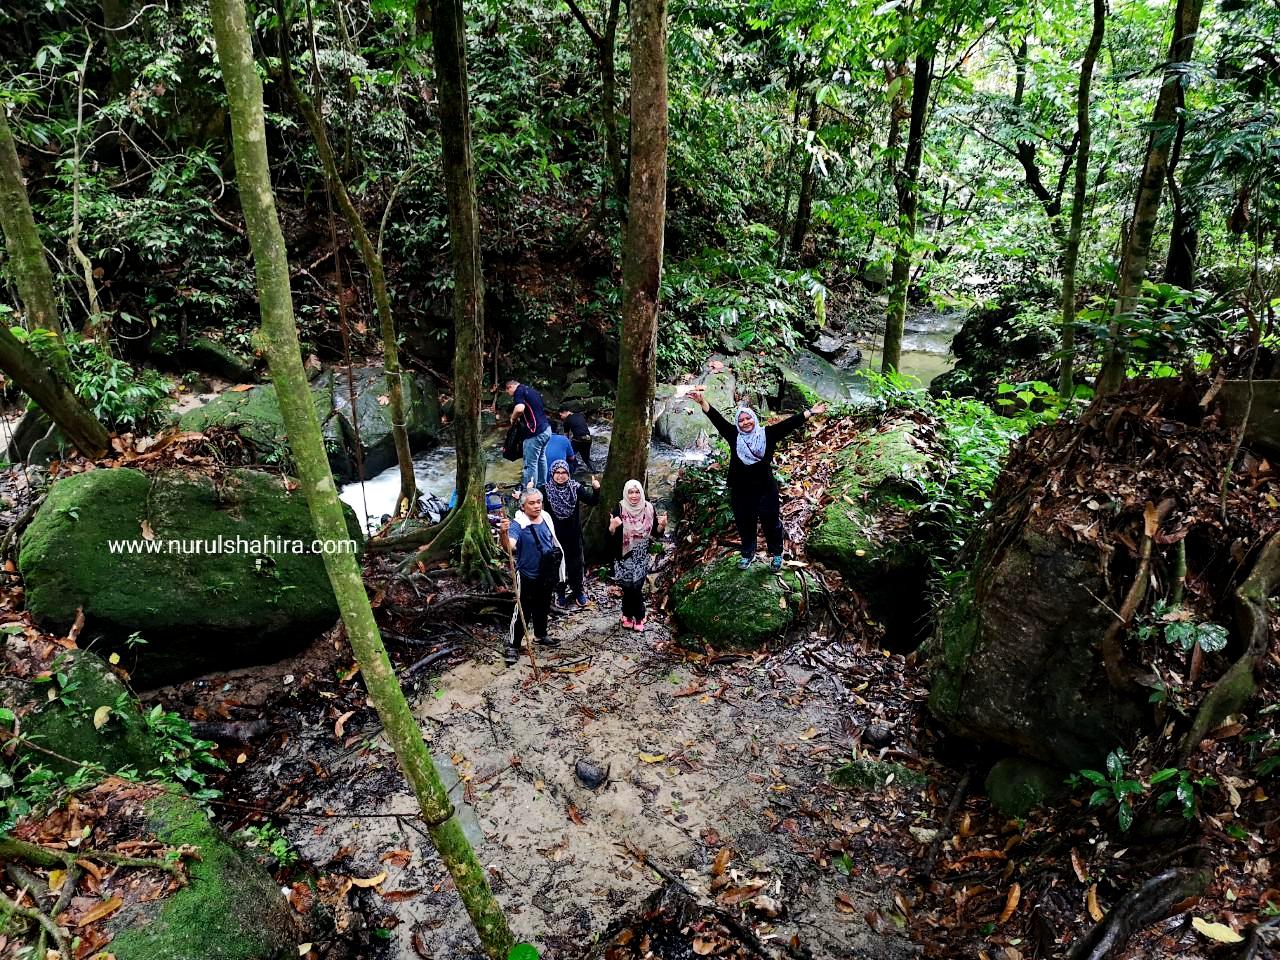 Pengalaman ATV di Kem Hati Rimba Kemensah, Ulu Klang Ampang